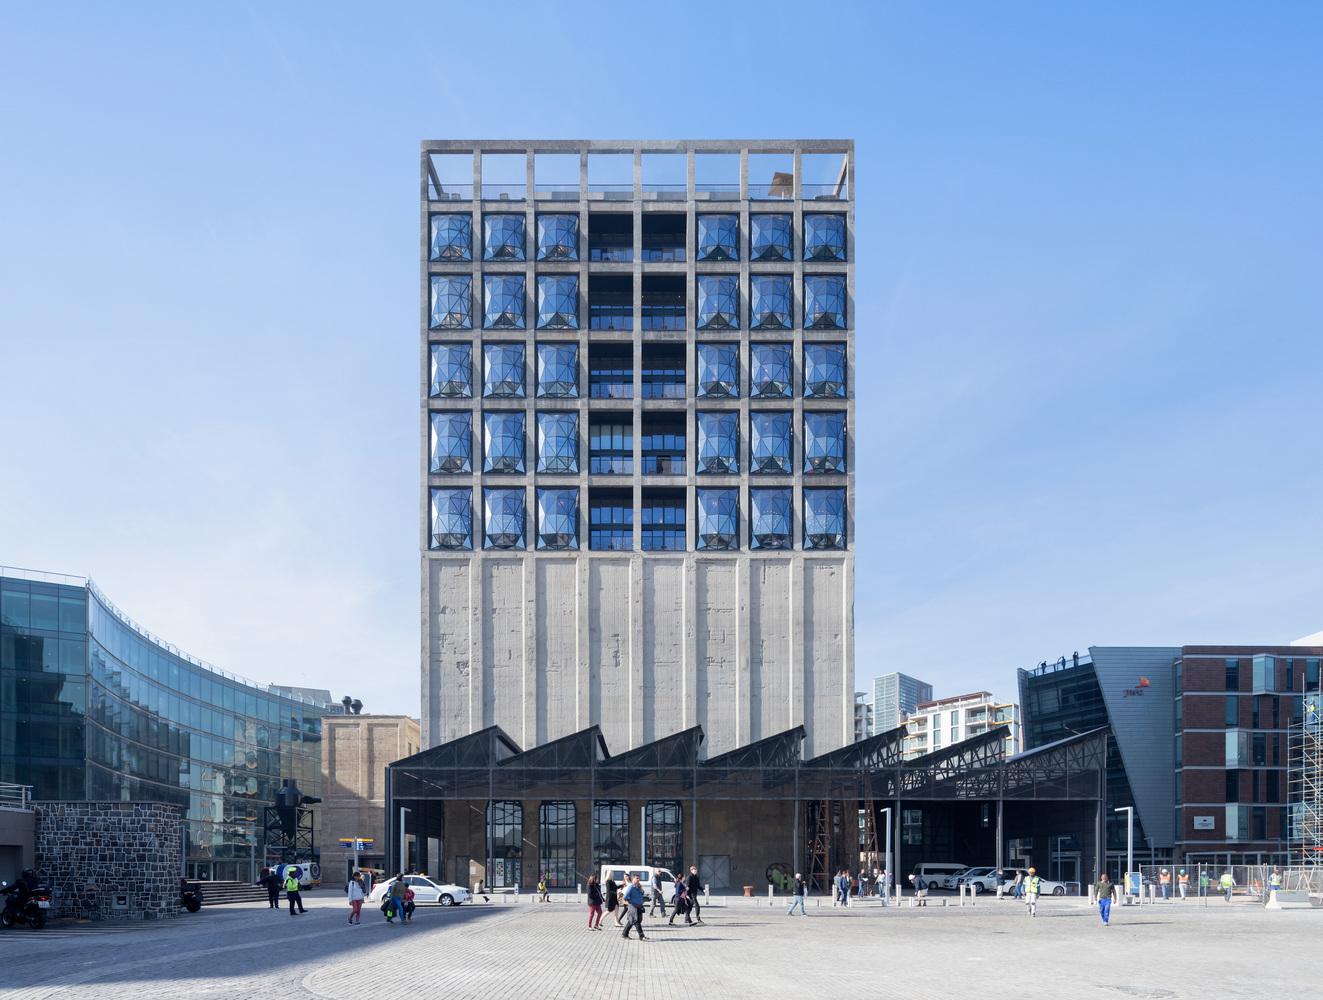 Kiến trúc nổi tiếng thế giới Zeitz MOCAA 2